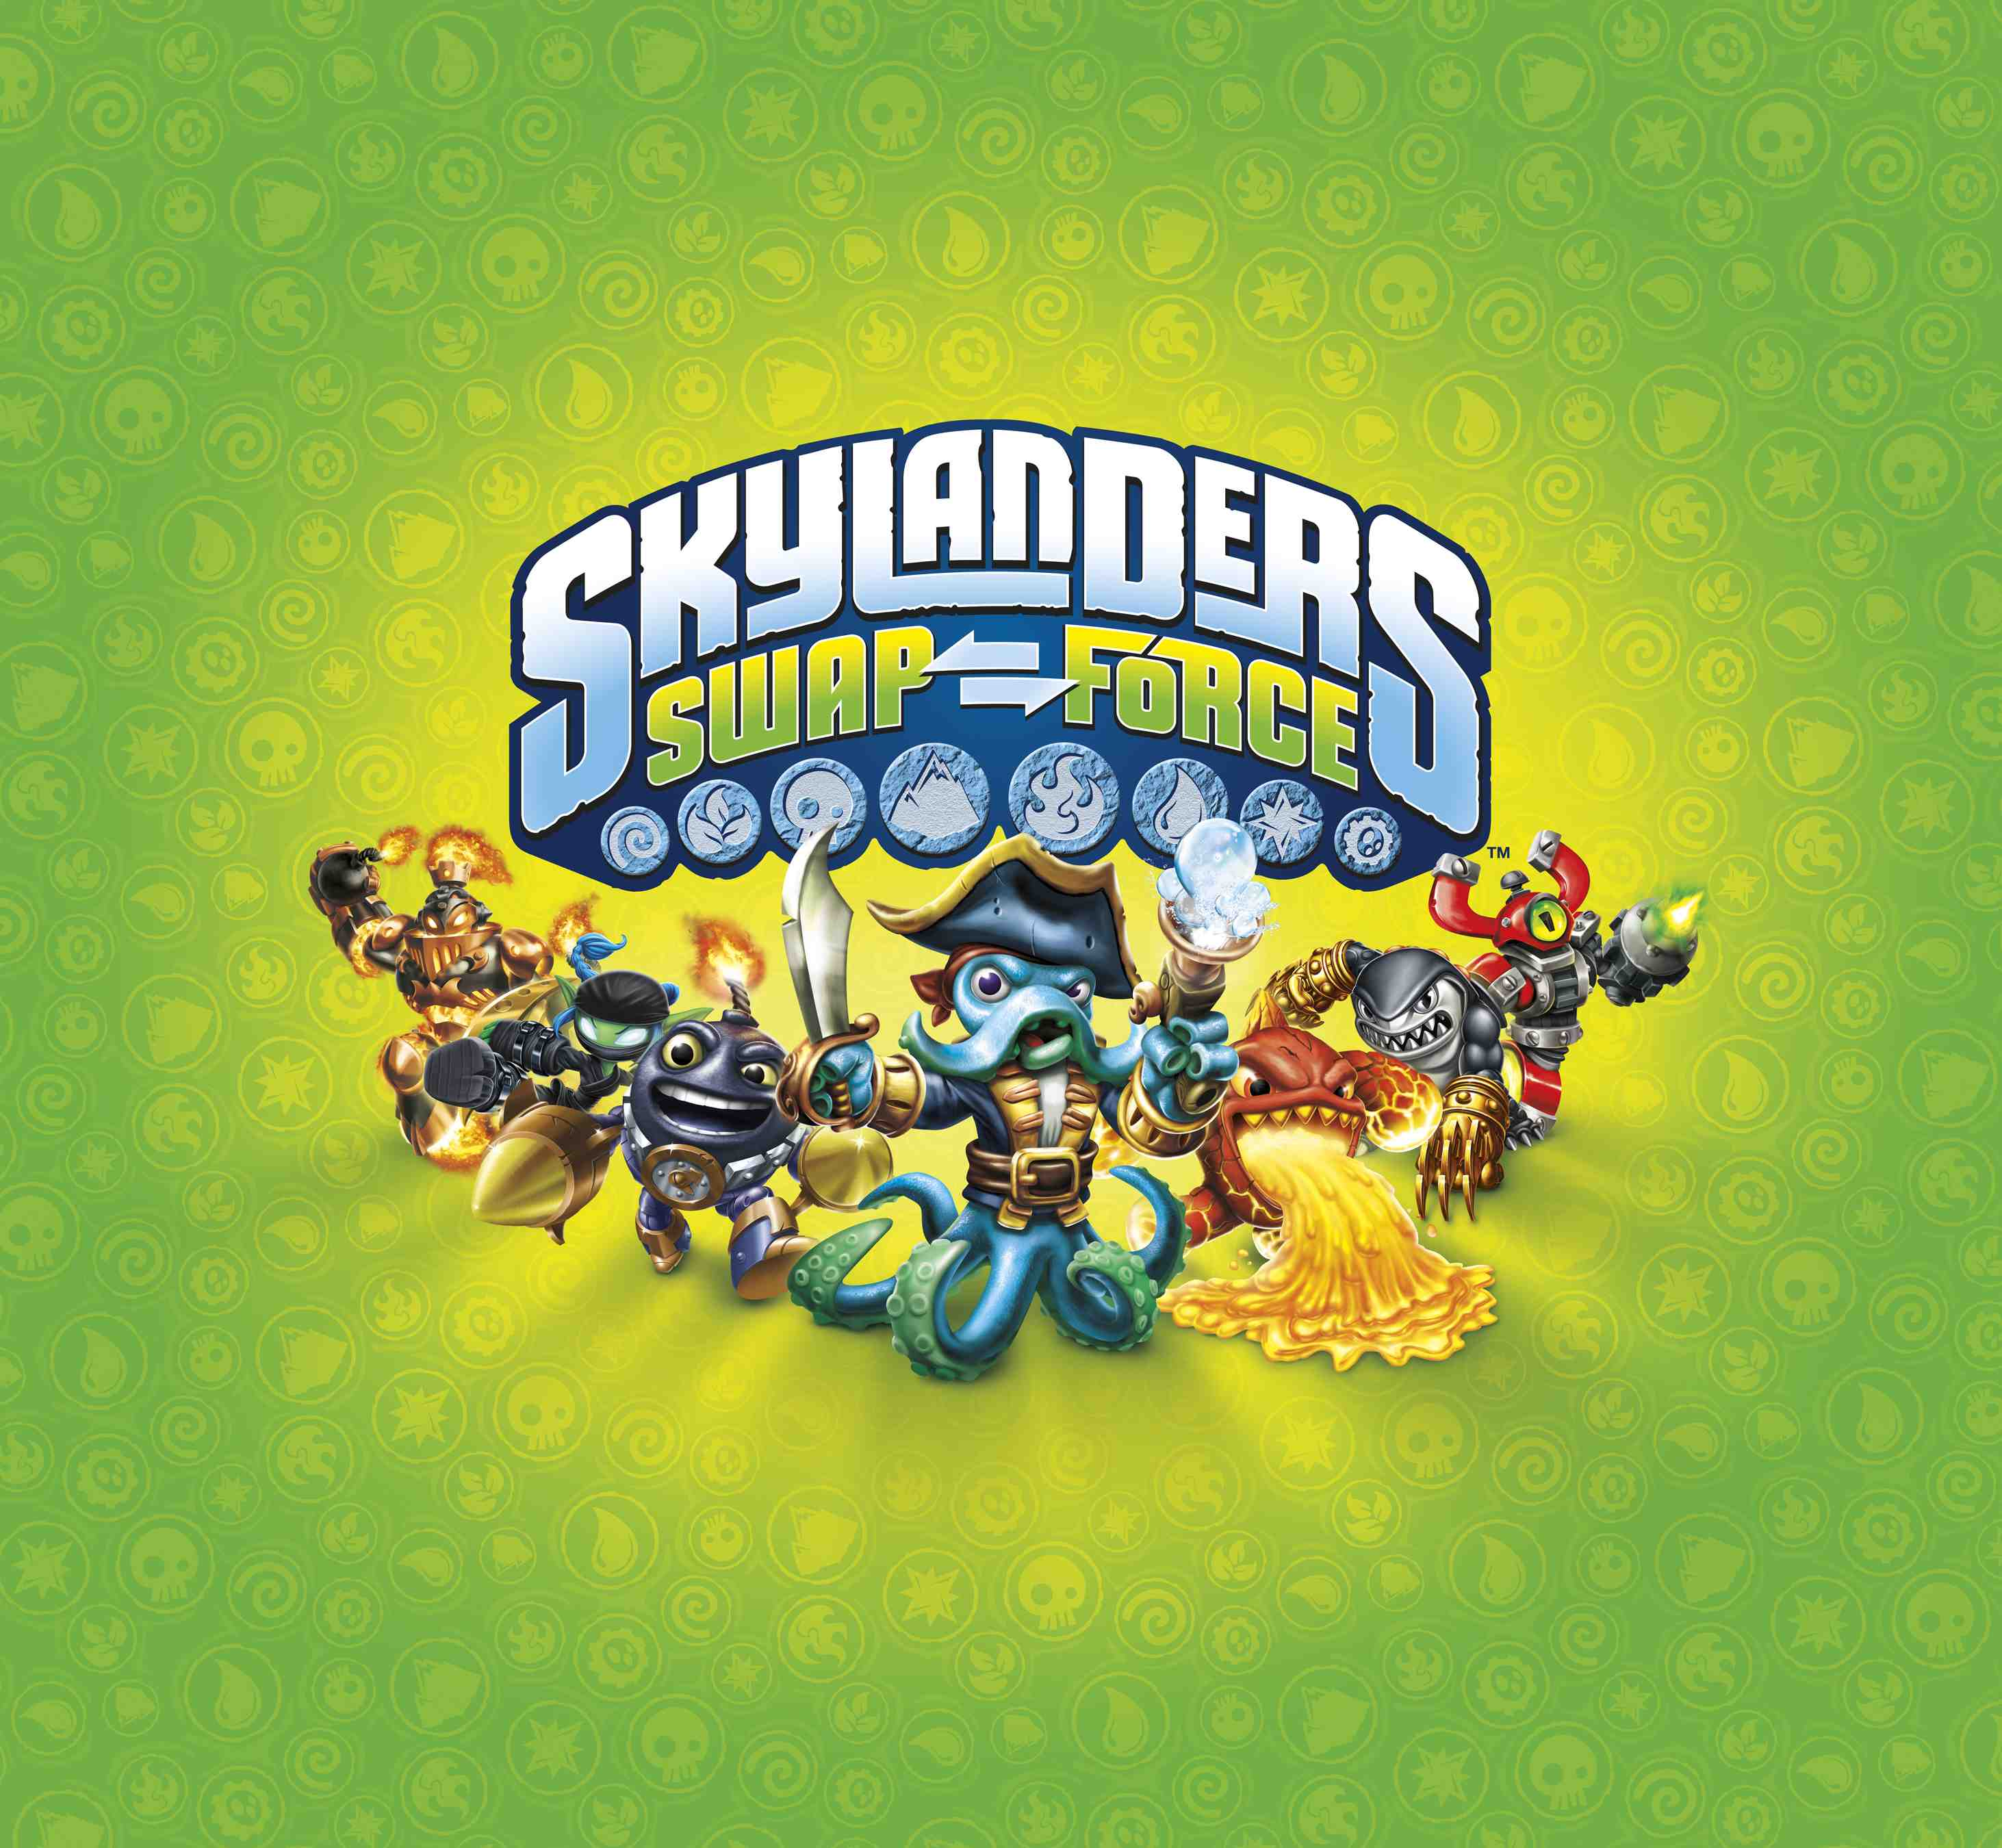 Skylanders_SWAP_Force_KeyArt_Standard_FINAL_Small